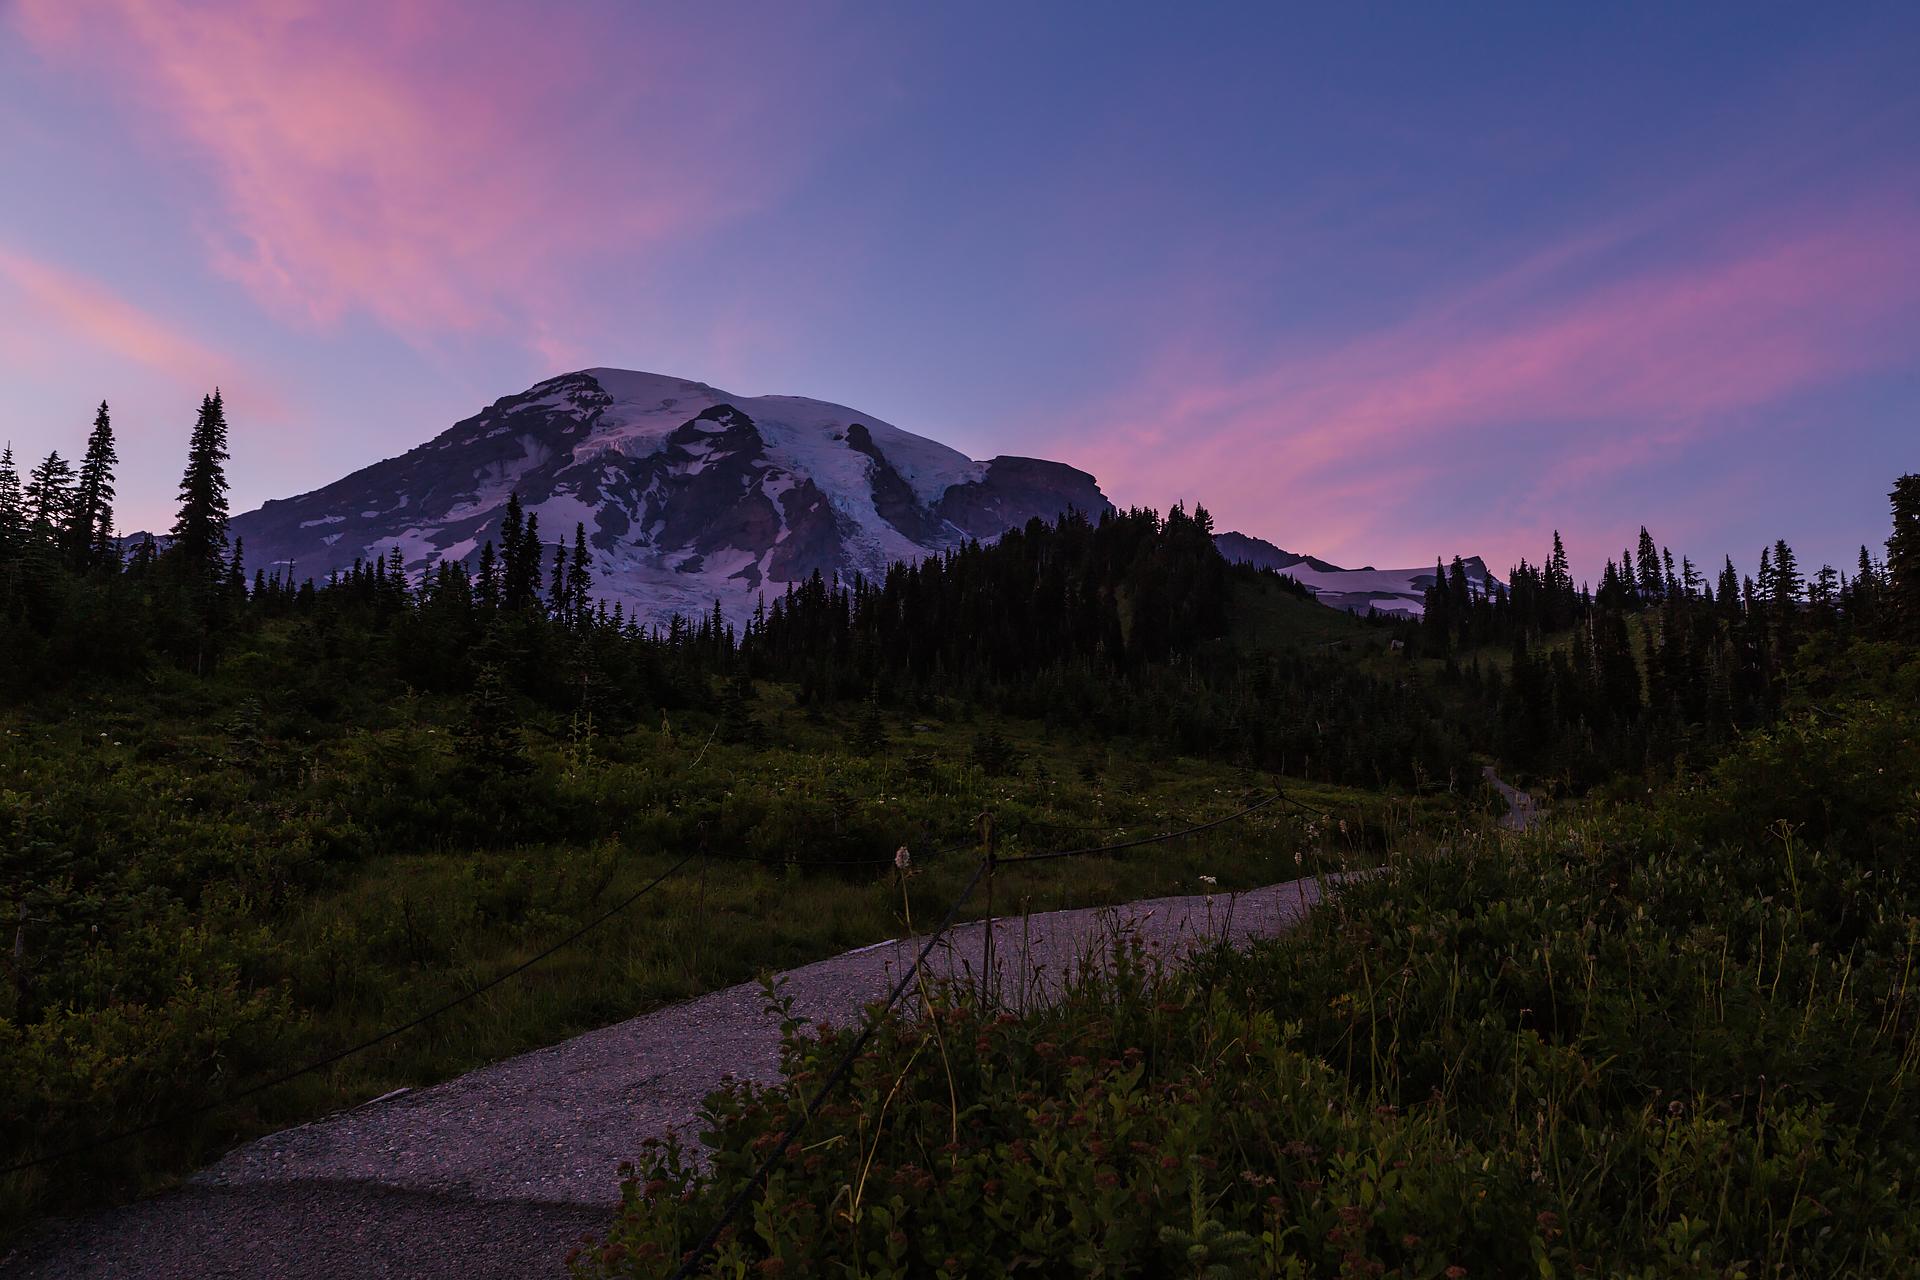 20130821-Mount-Rainier-Day-1-225.jpg